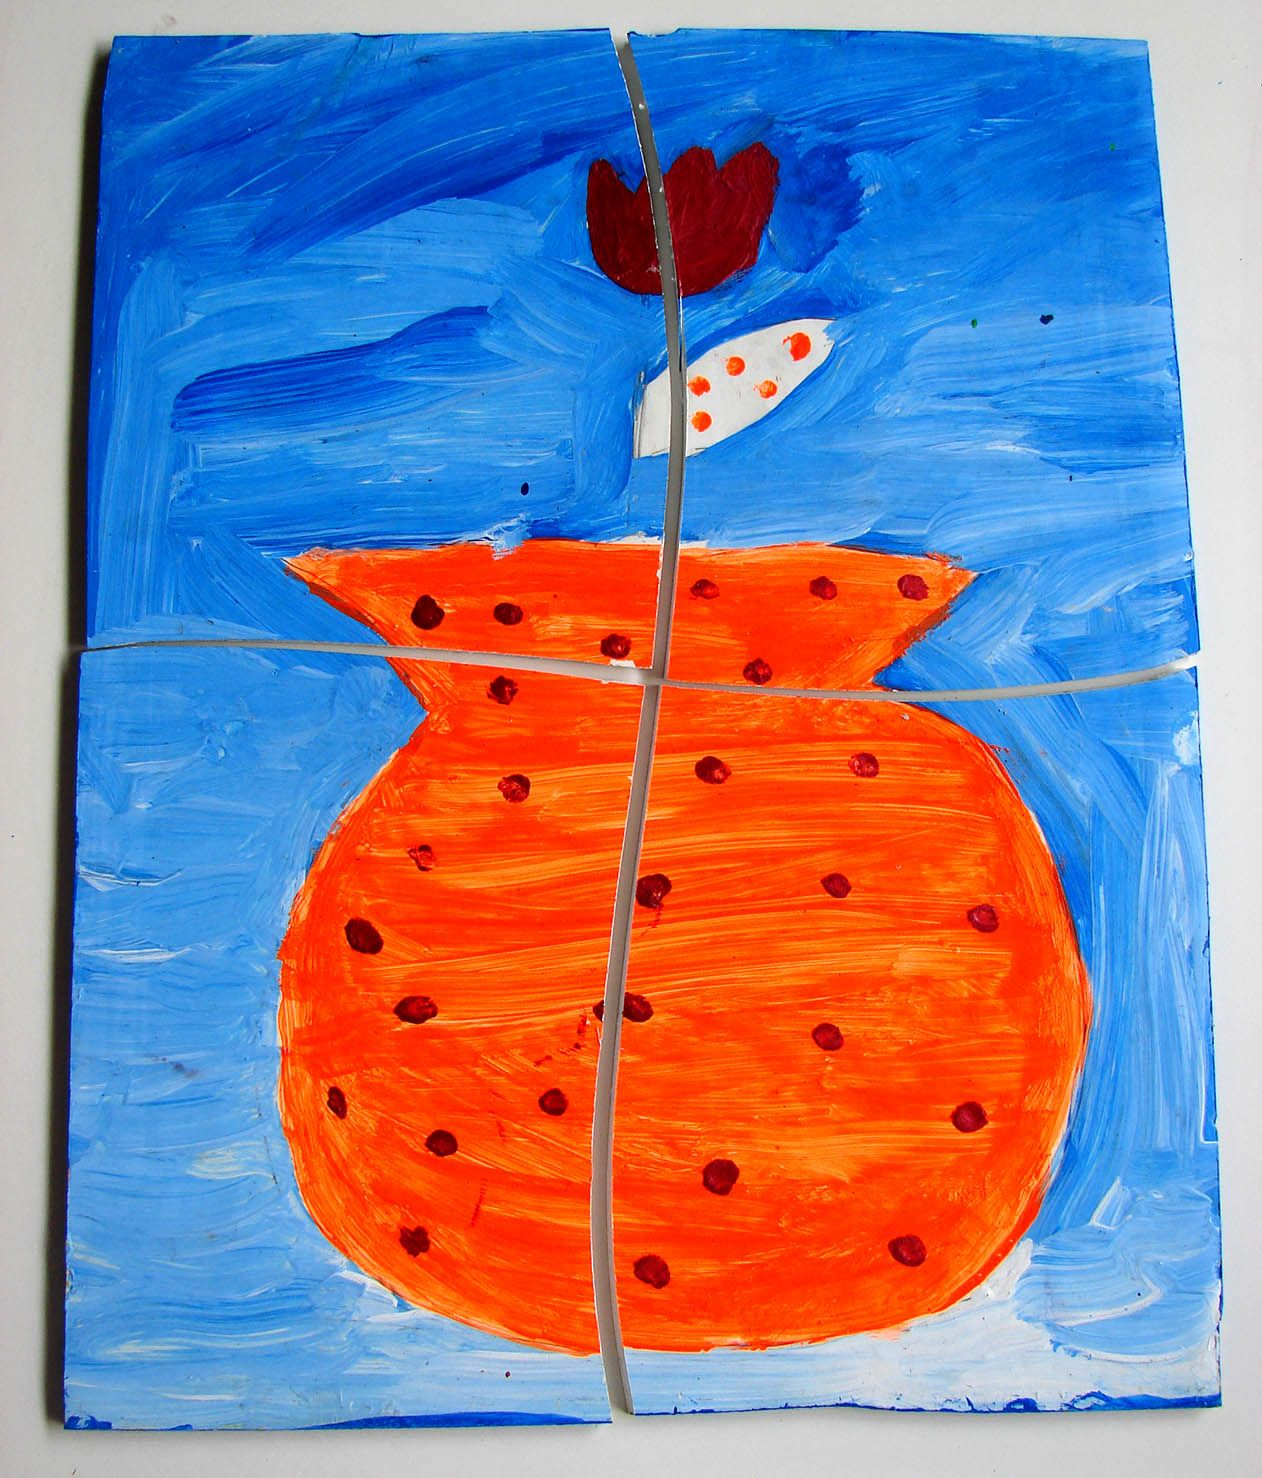 Rompecabezas Pictorico Tema Libre Art Painting